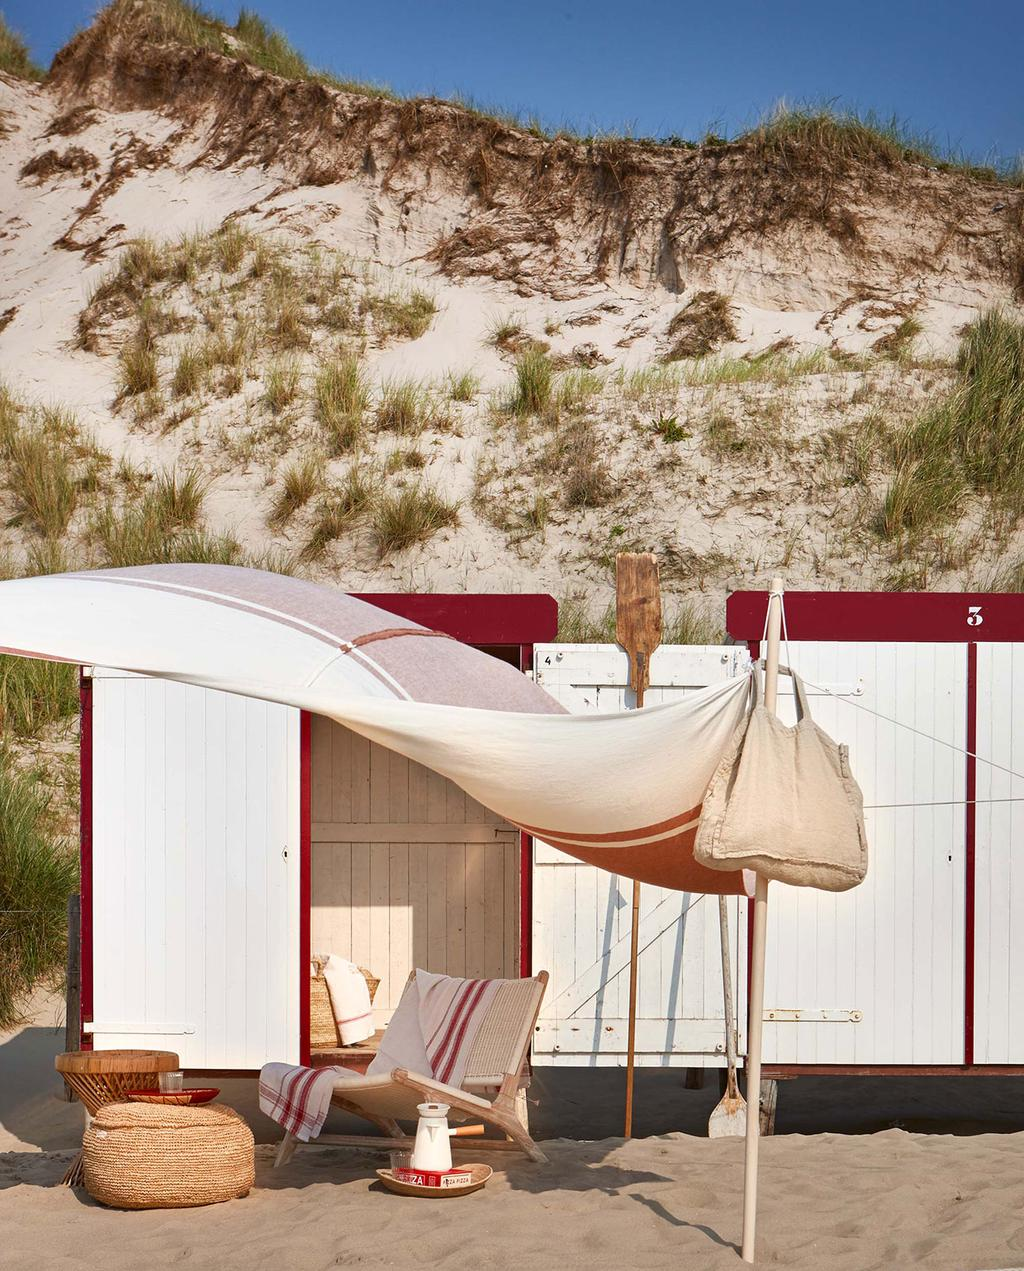 vtwonen 08-2016 | strandhuisje met laken in de wind